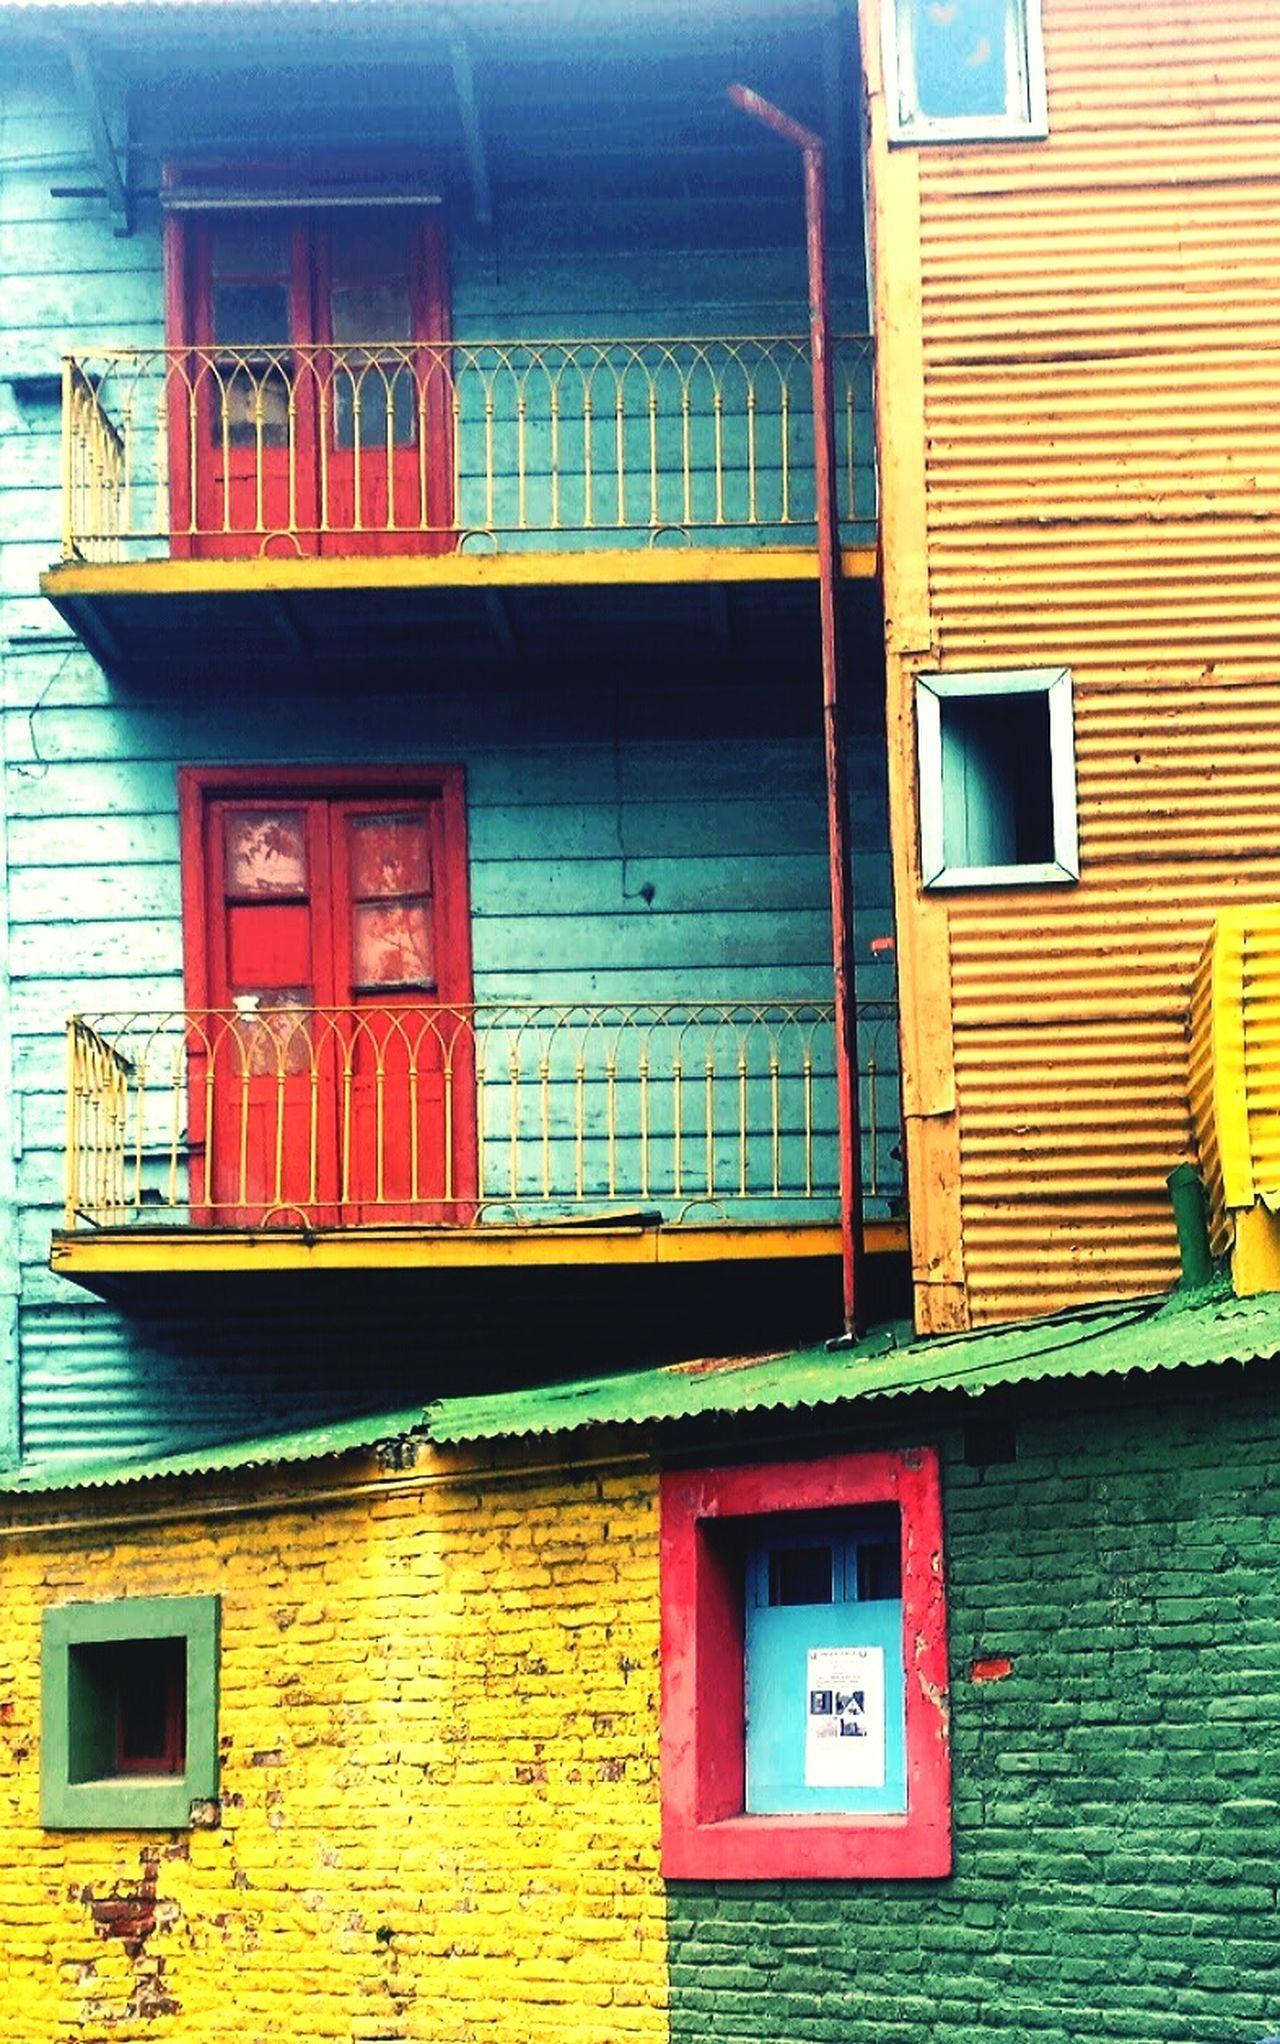 La Boca Buenosaires EyeEm Buenos Aires Arquitecture Colorful Neighborhood Windows_aroundtheworld Lines And Shapes Hello World Traveling